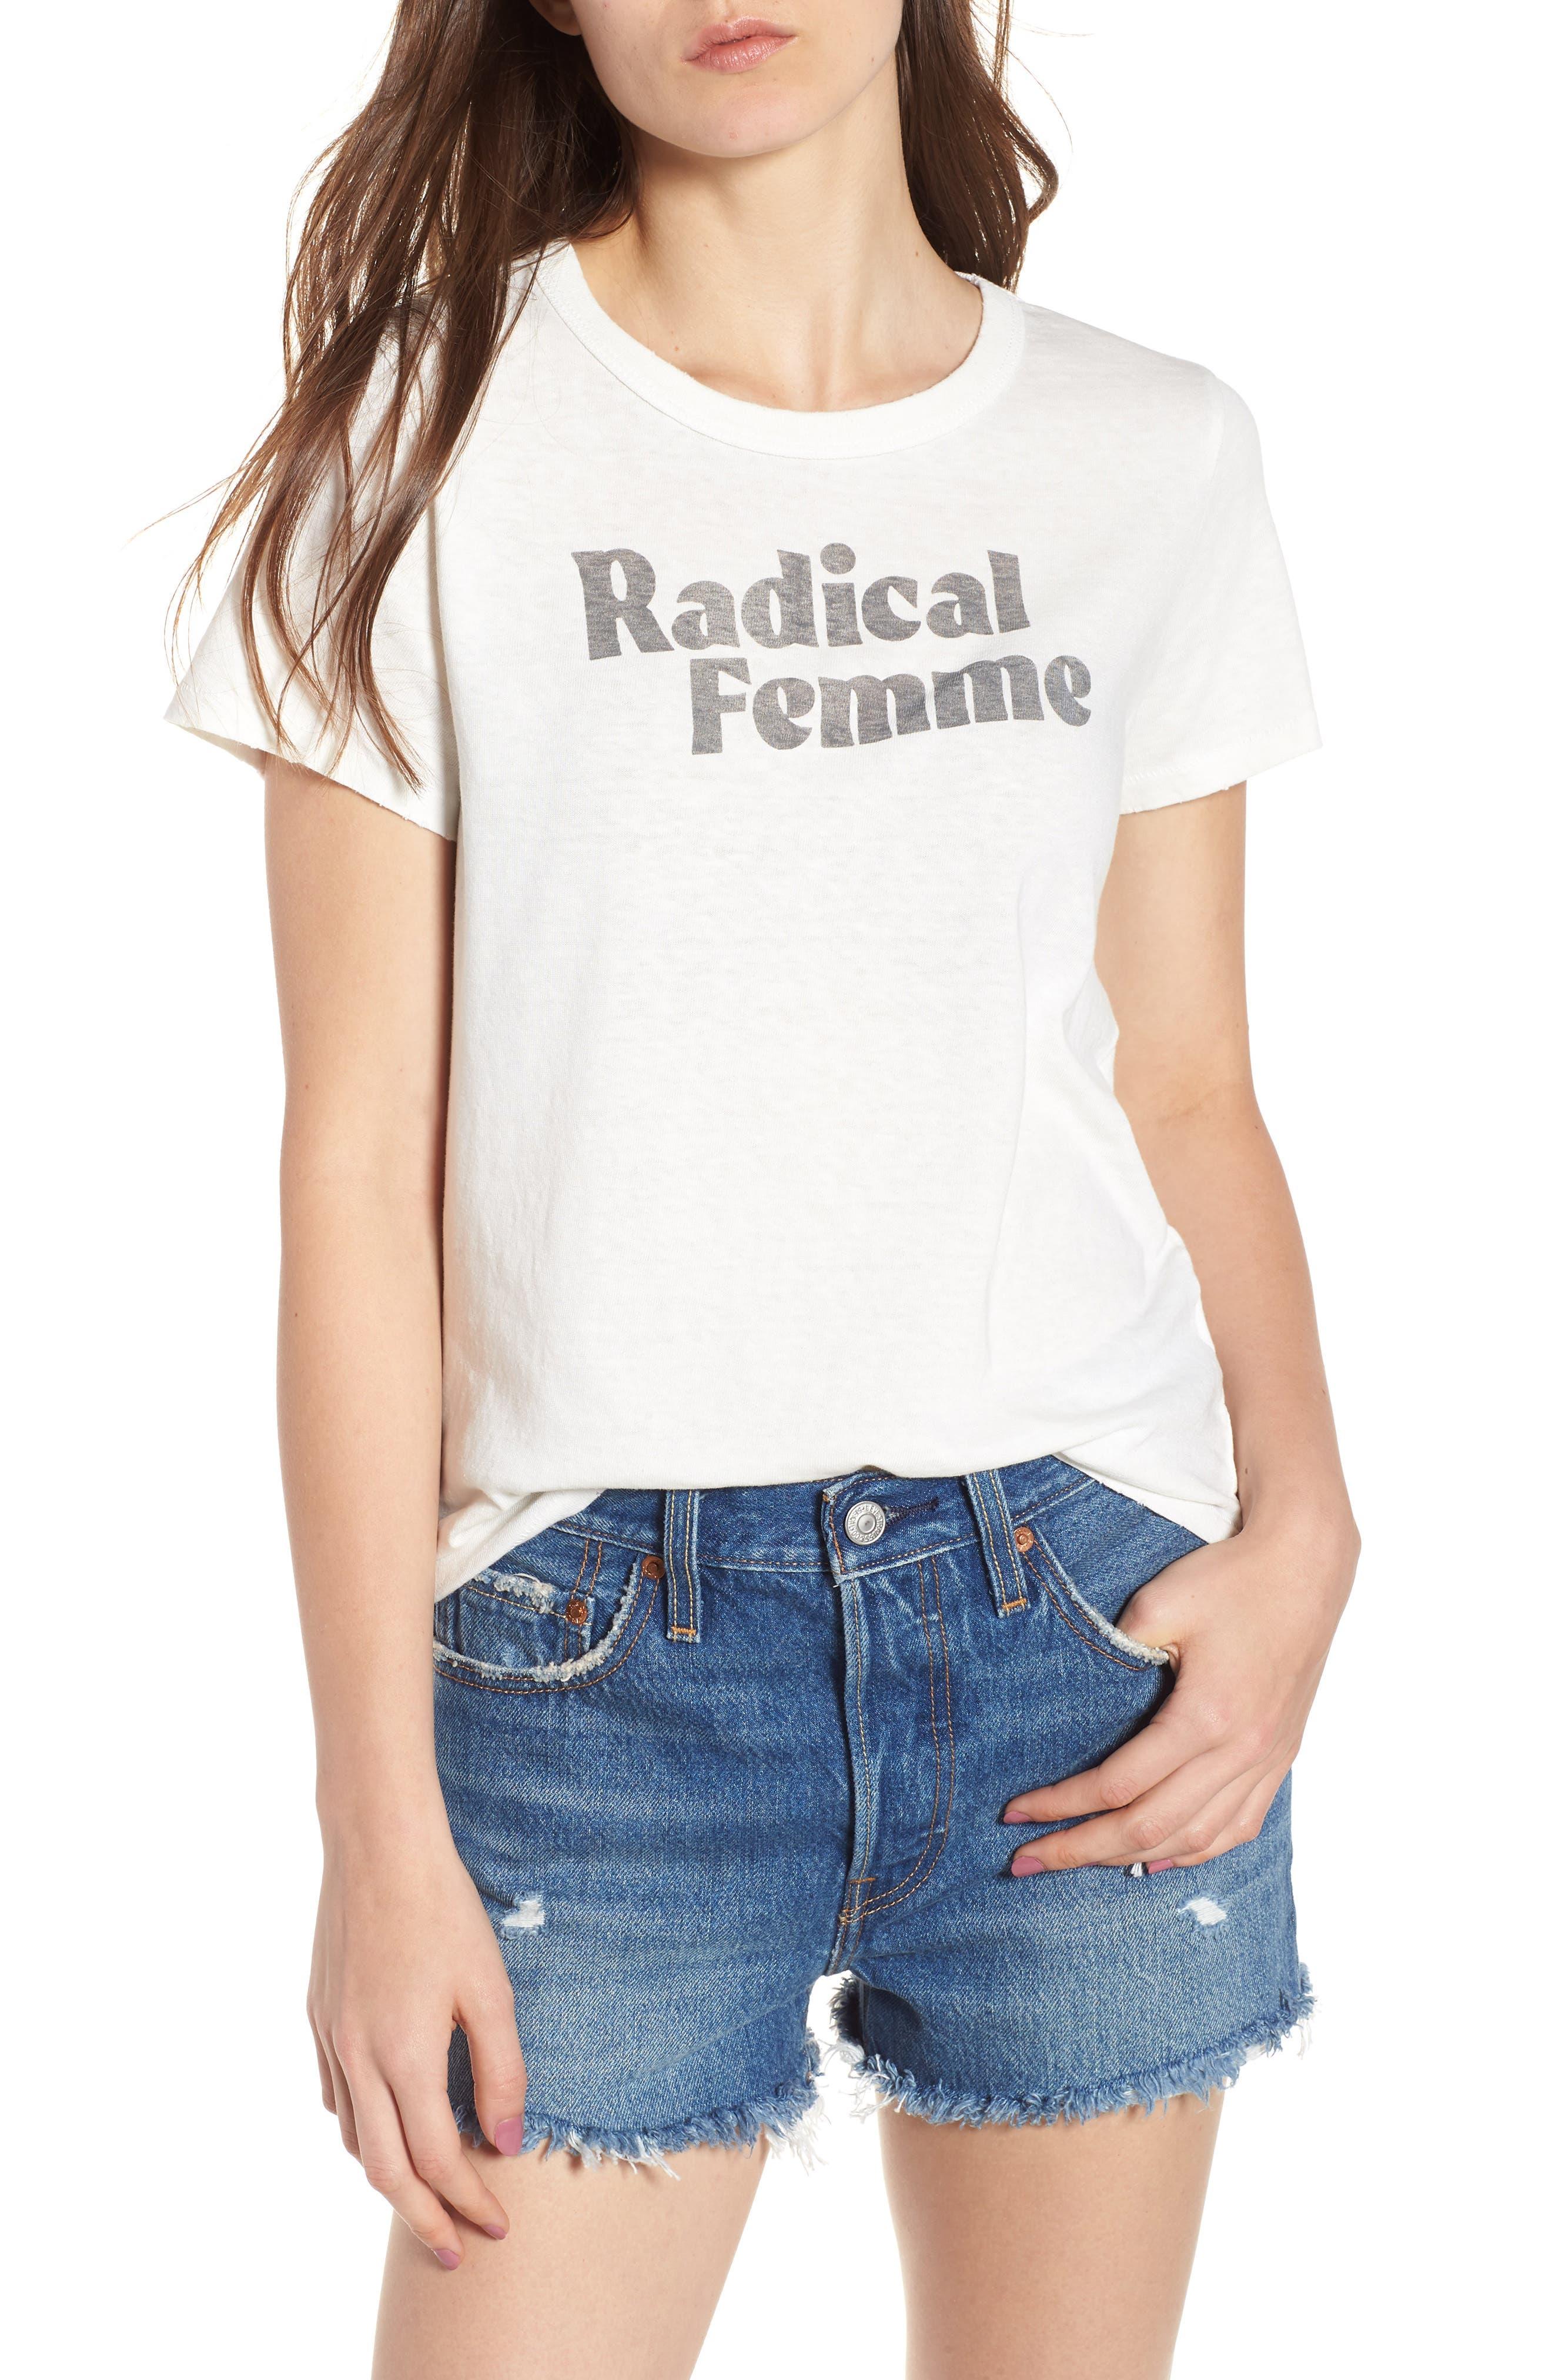 Radical Femme Tee,                         Main,                         color, 110